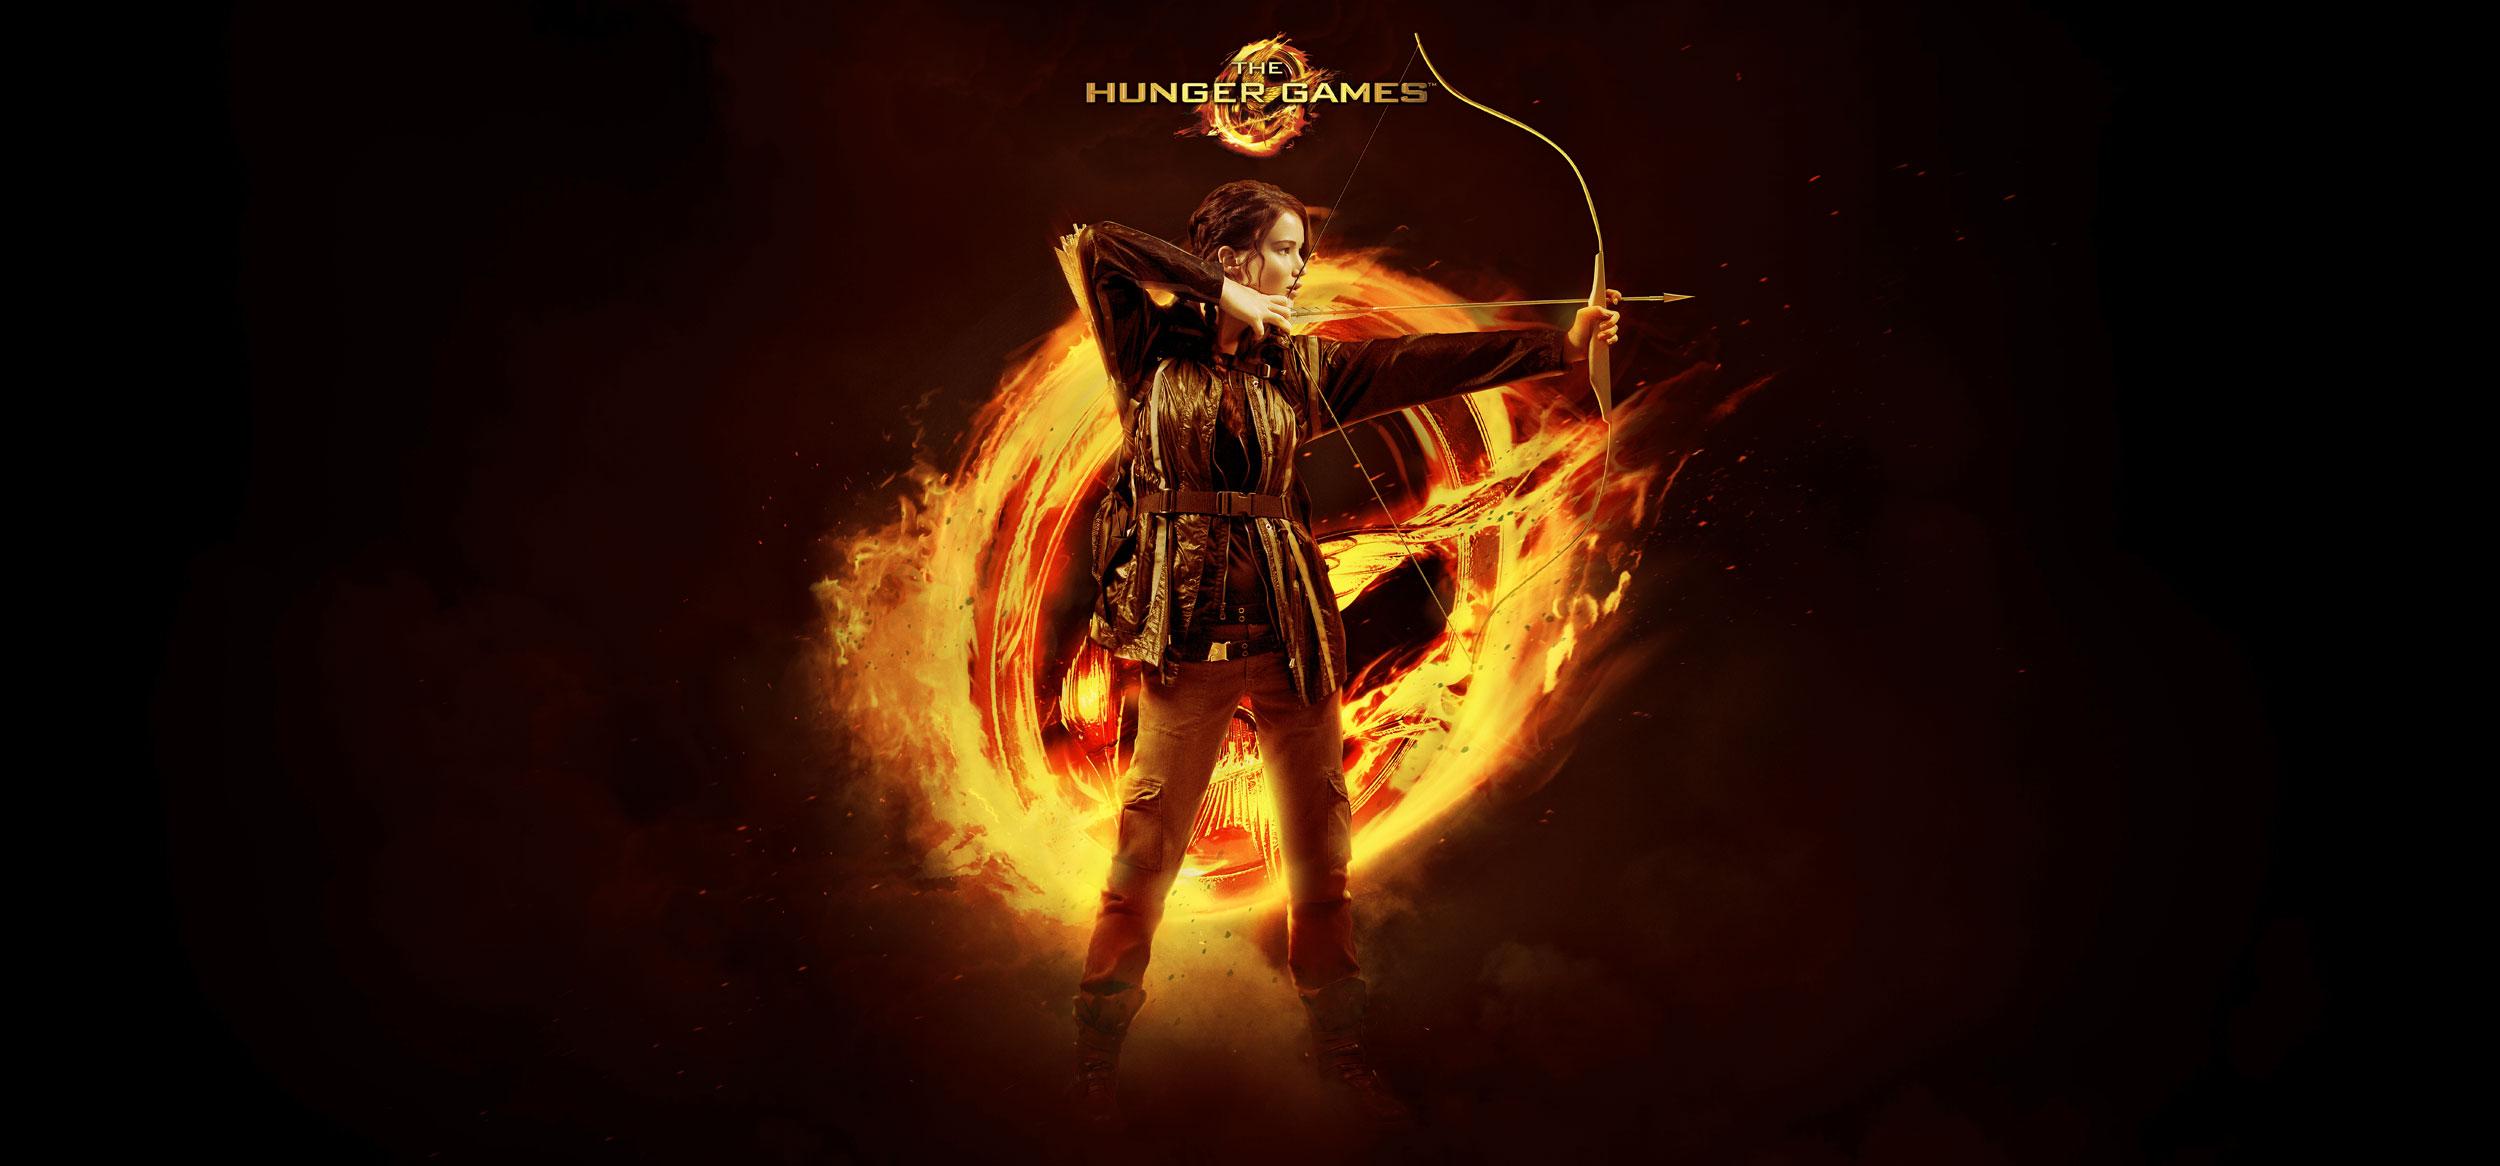 Hunger Games Header IMG